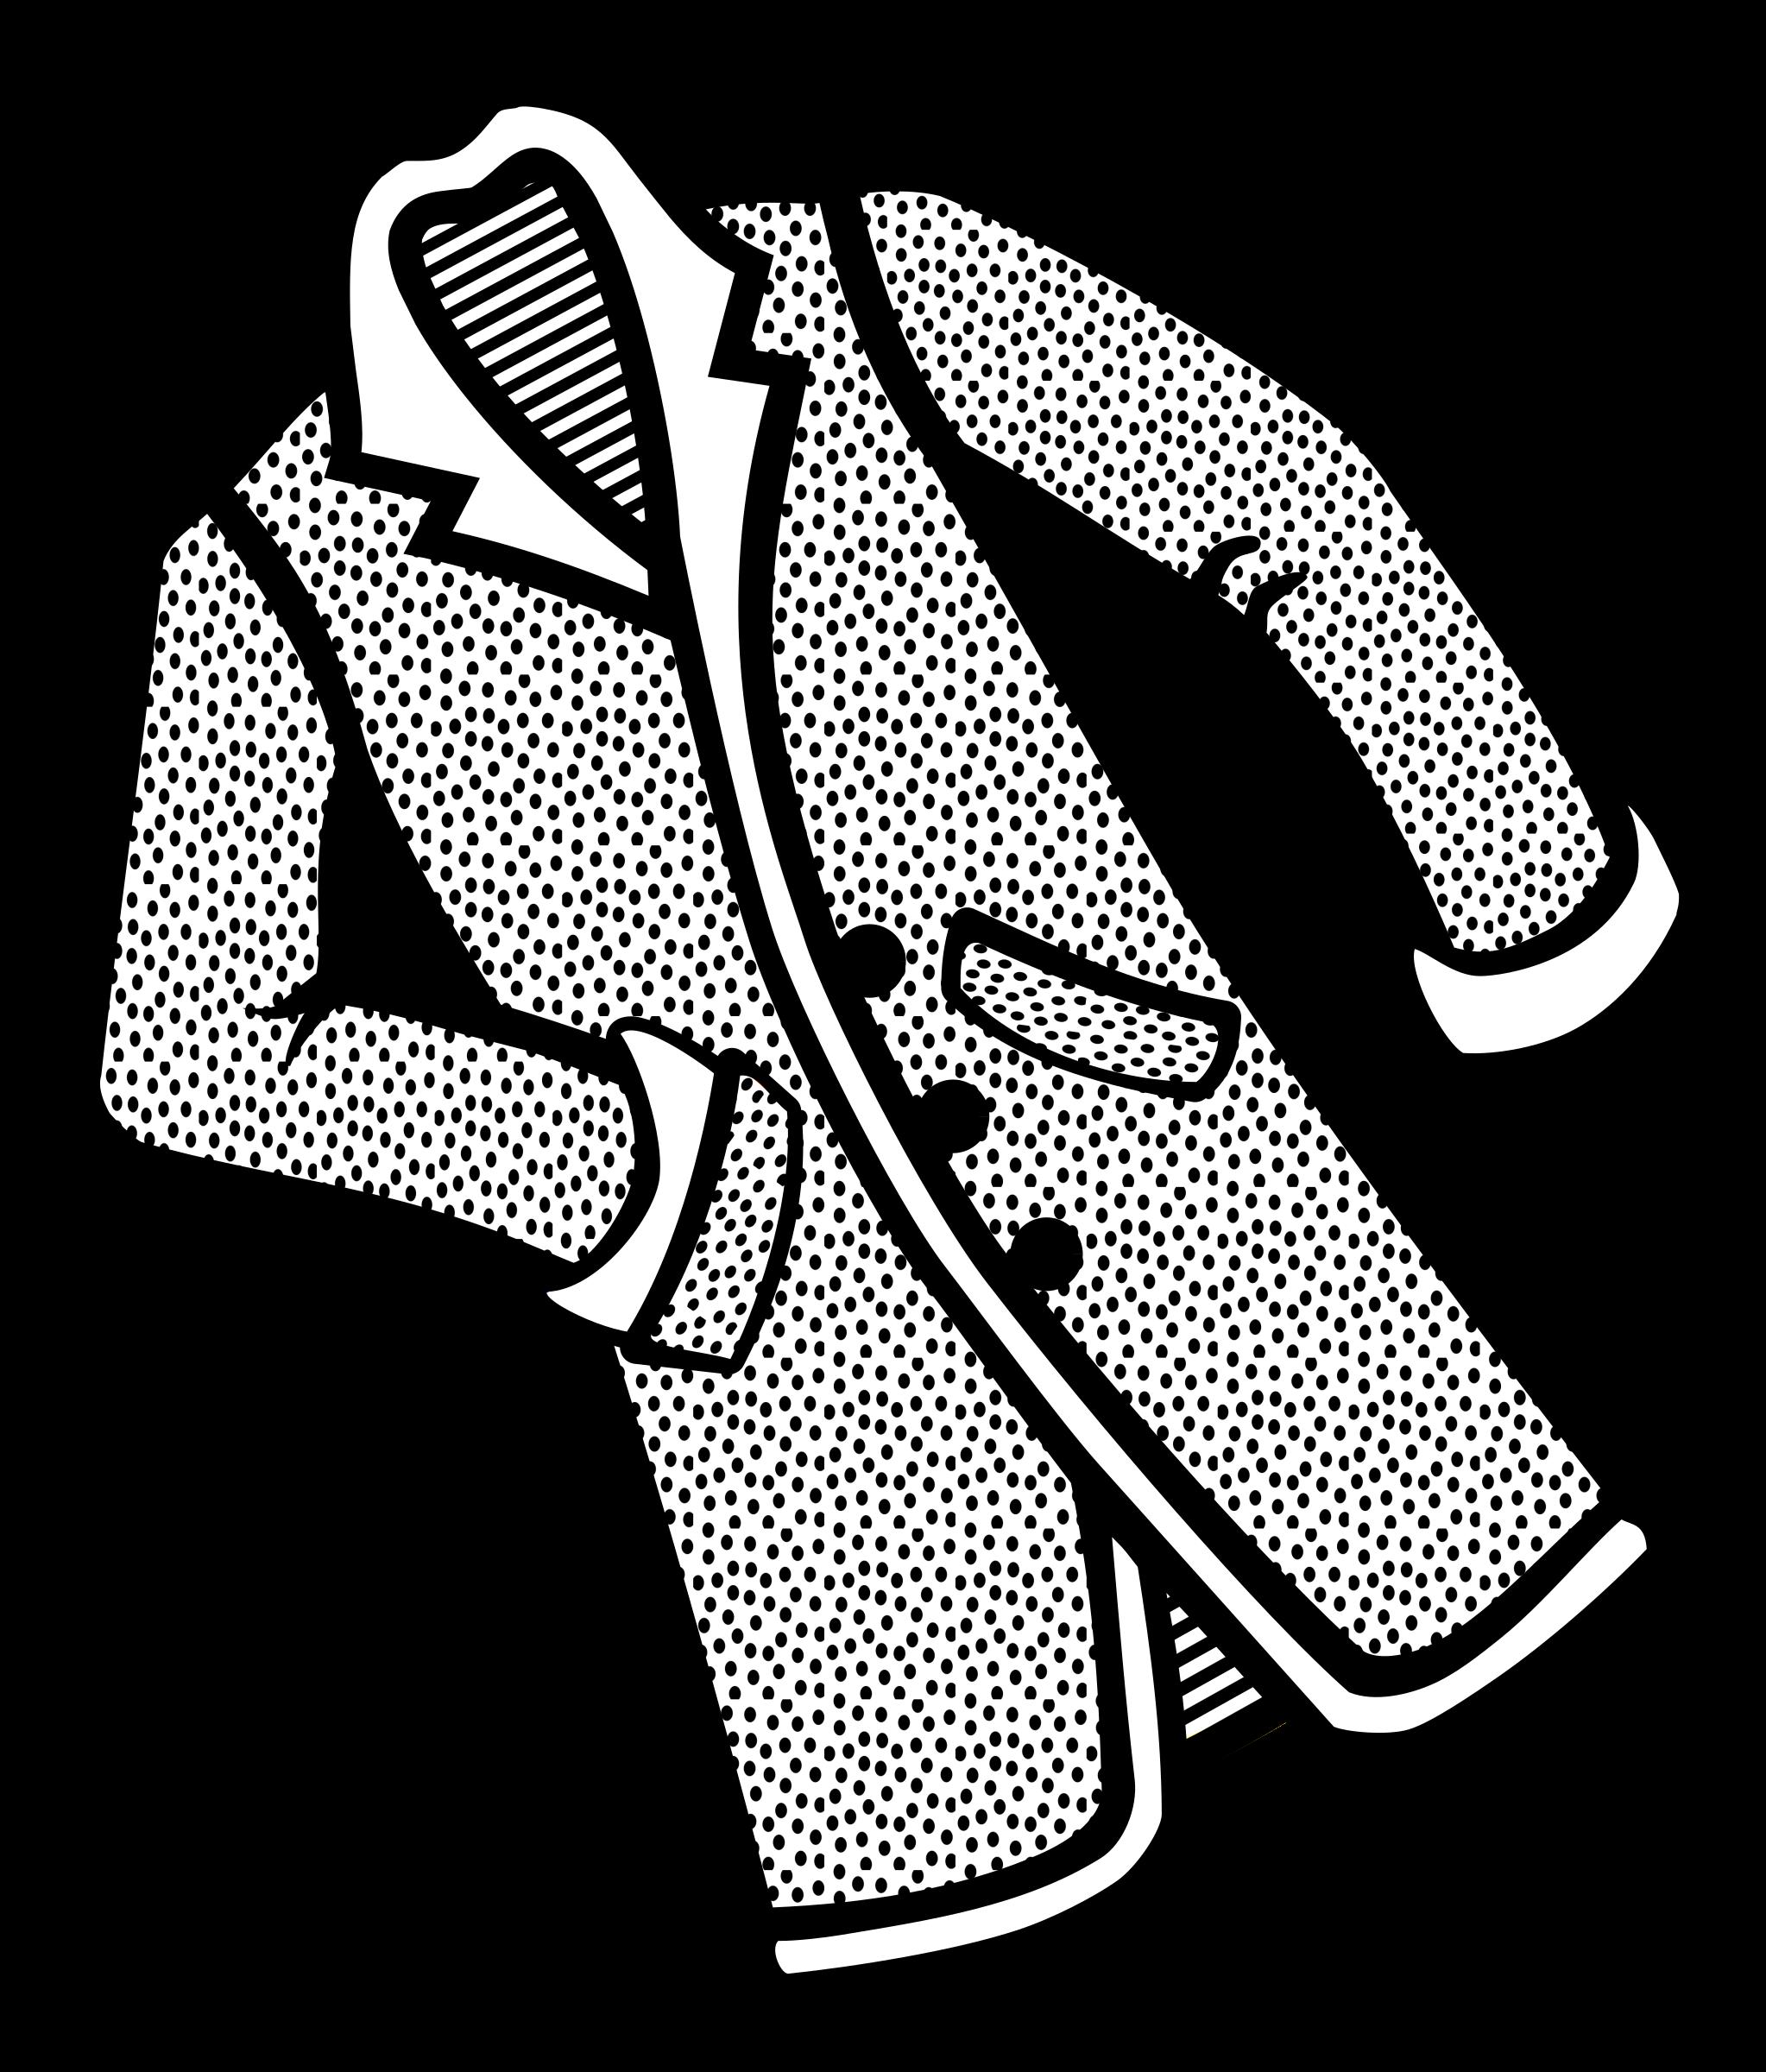 Coat clipart coat outline. Lab coats jacket raincoat